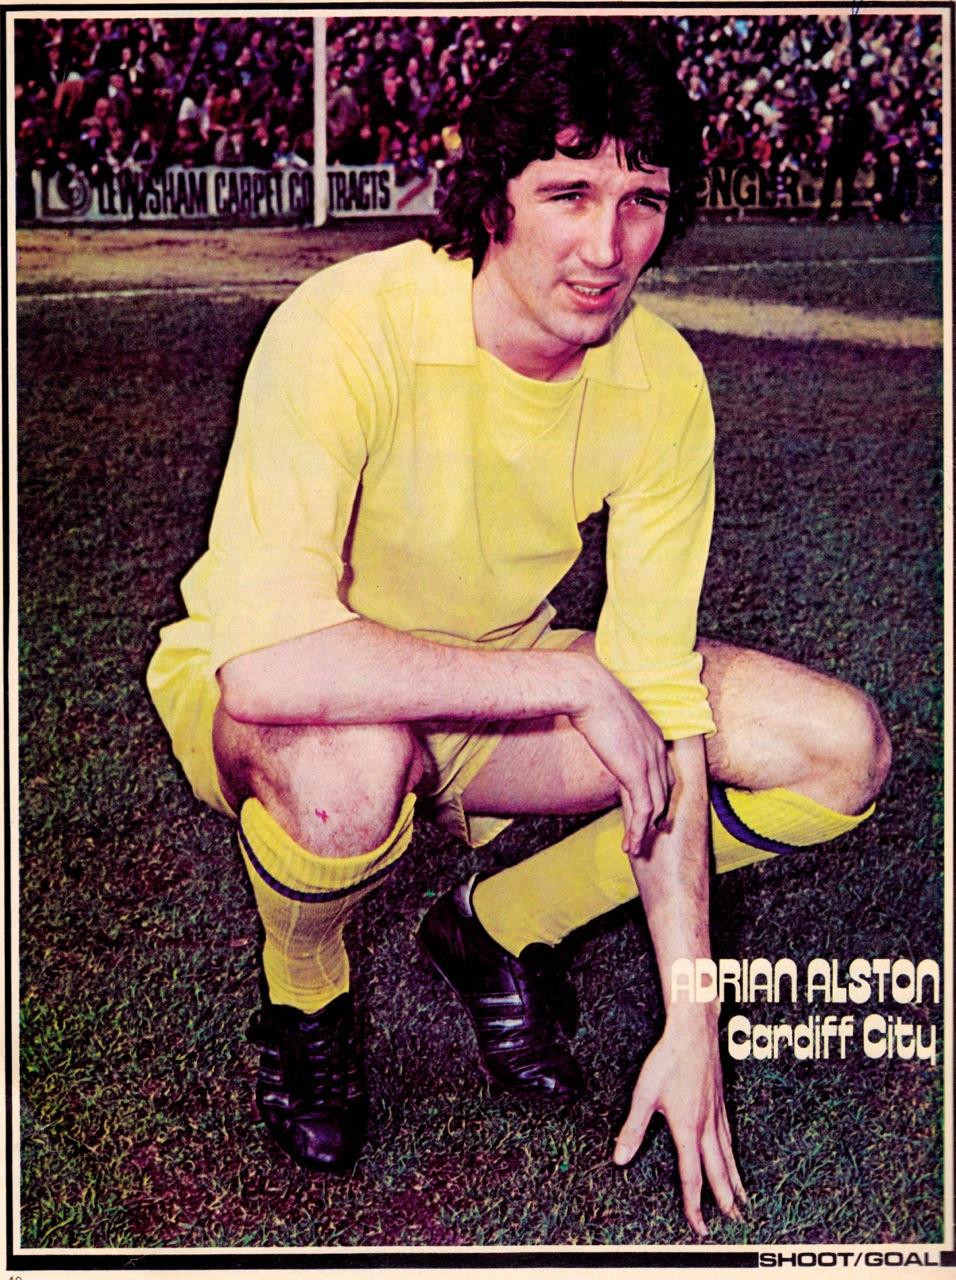 Adrian Alston, Cardiff City 1976